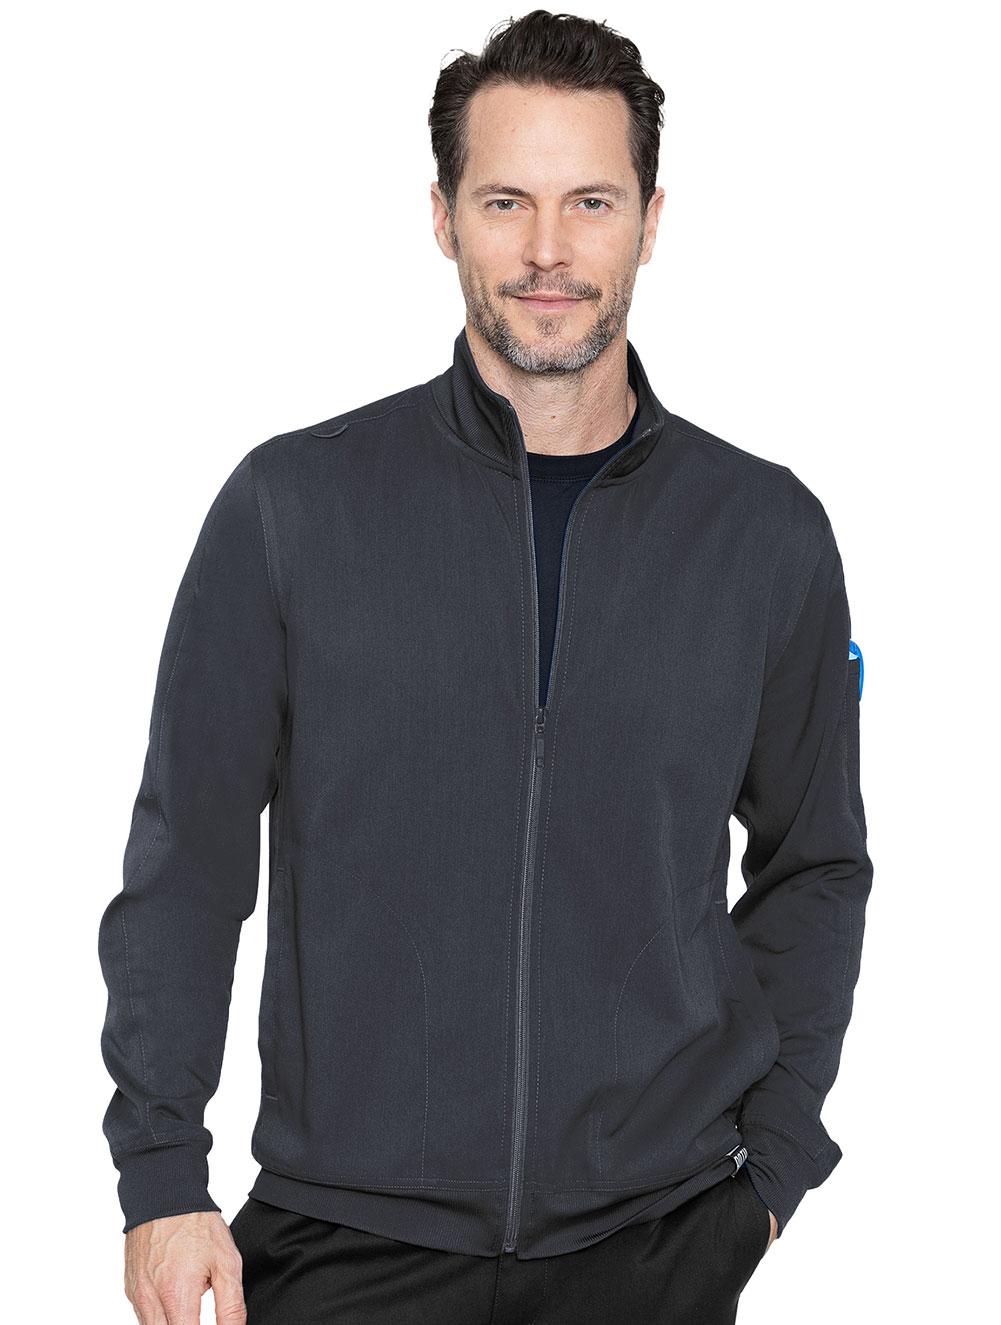 Men's Warmup Jacket